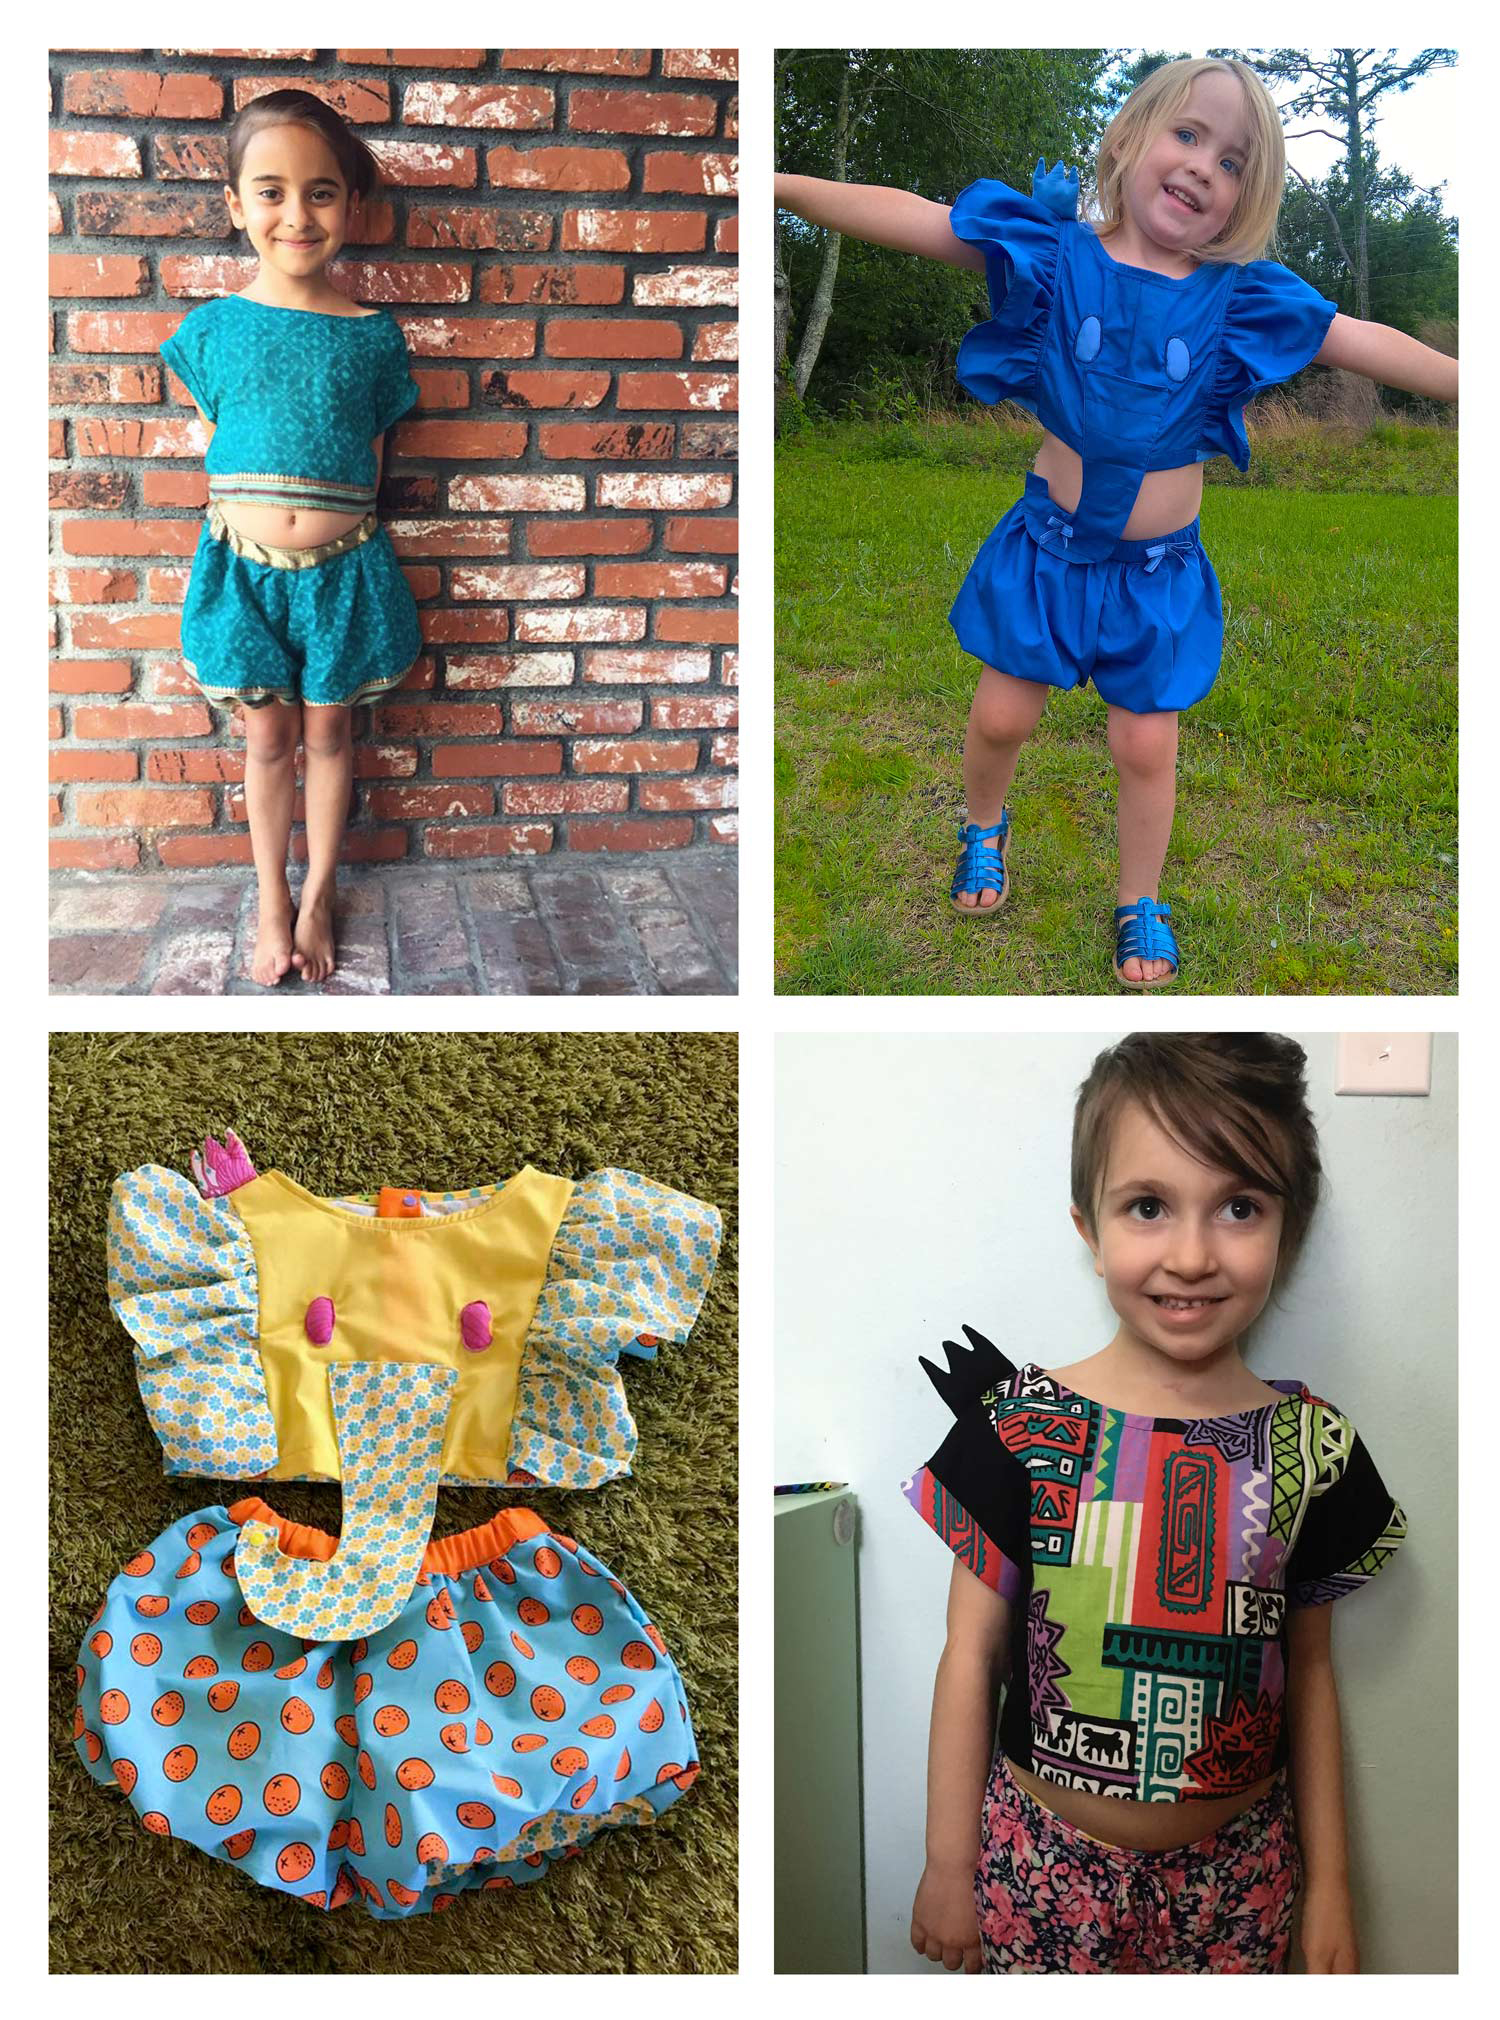 tester photo credits   top left: Katie   top right: Danielle, Starlynn's Closet   bottom left: Ari, Max-California   bottom right: me!